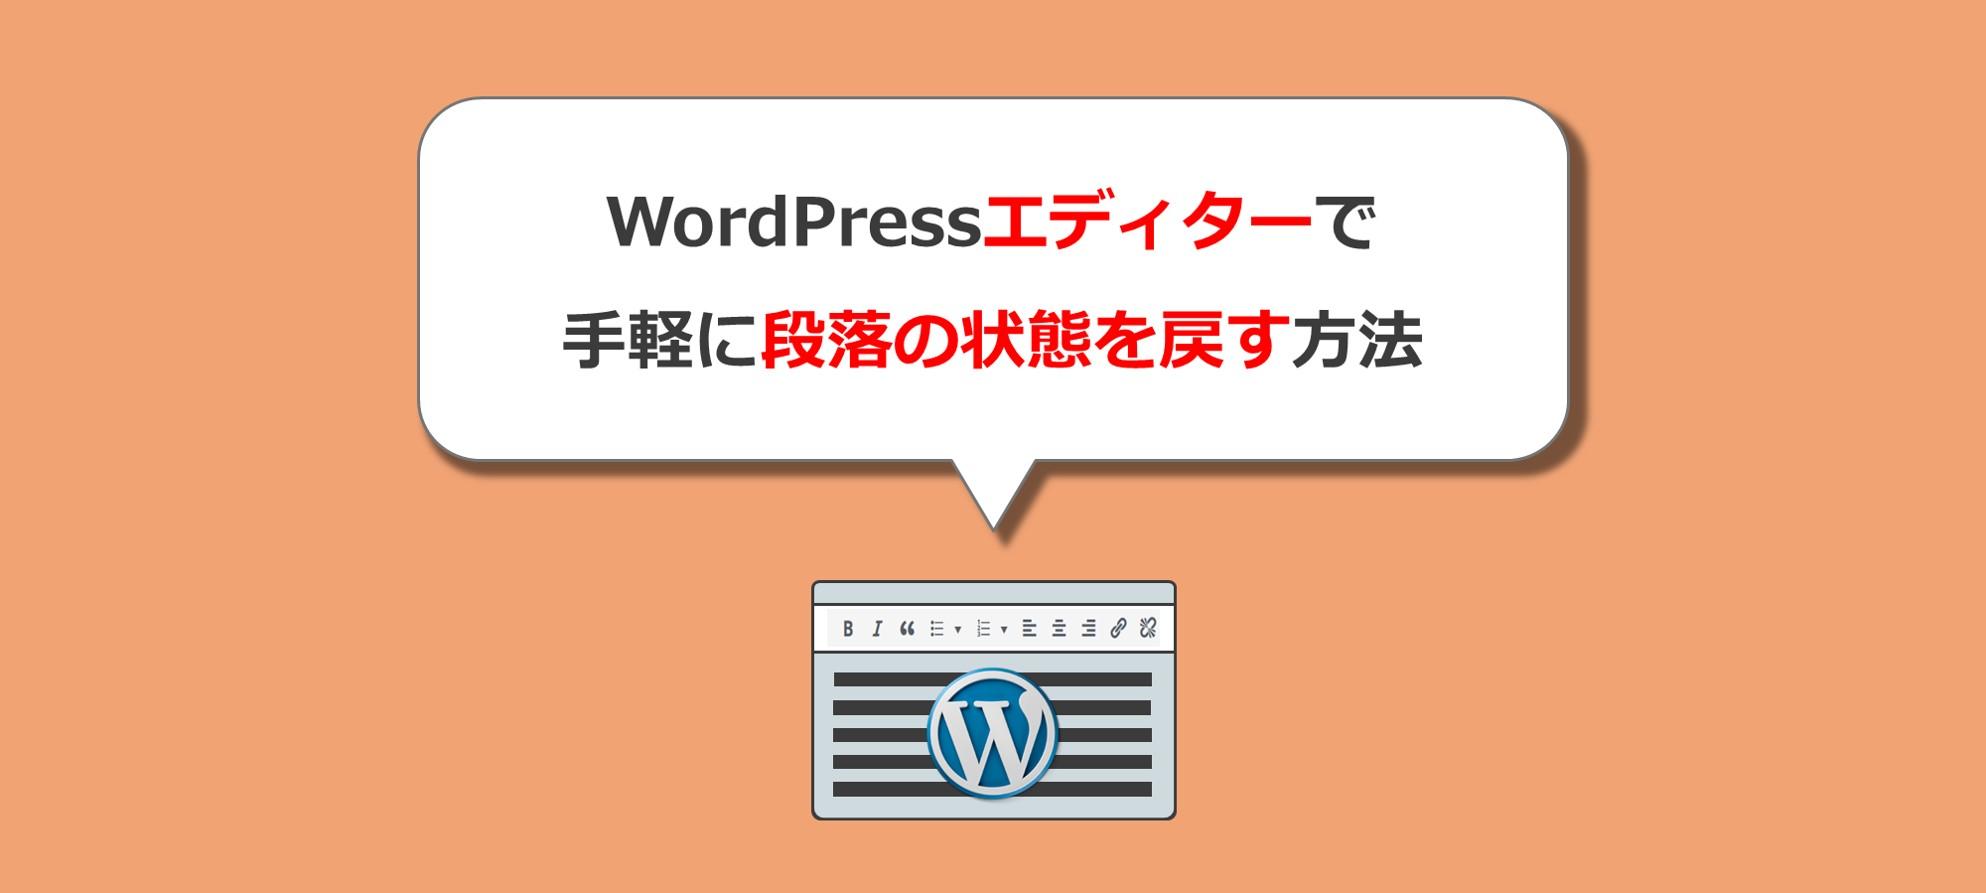 WordPressエディターで手軽に段落の状態を戻す方法